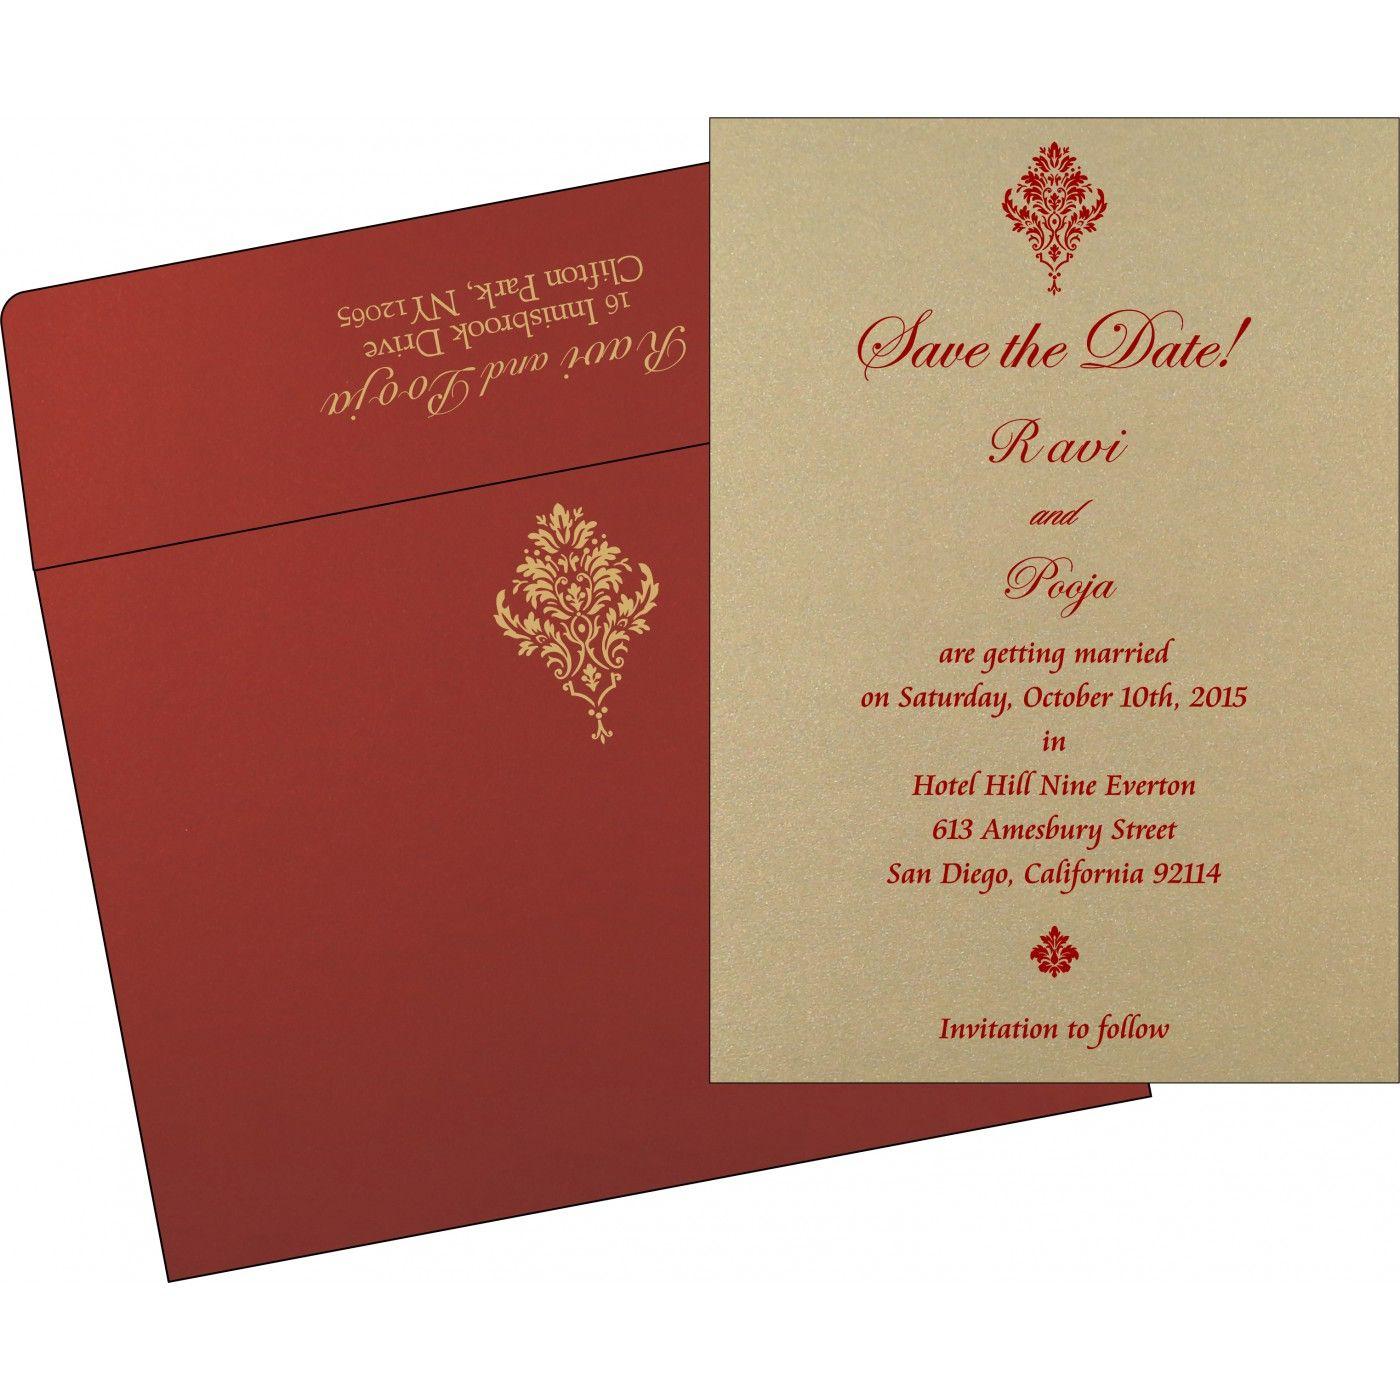 Indian Wedding Cards | IN-1494 | 123WeddingCards | Indian Wedding ...